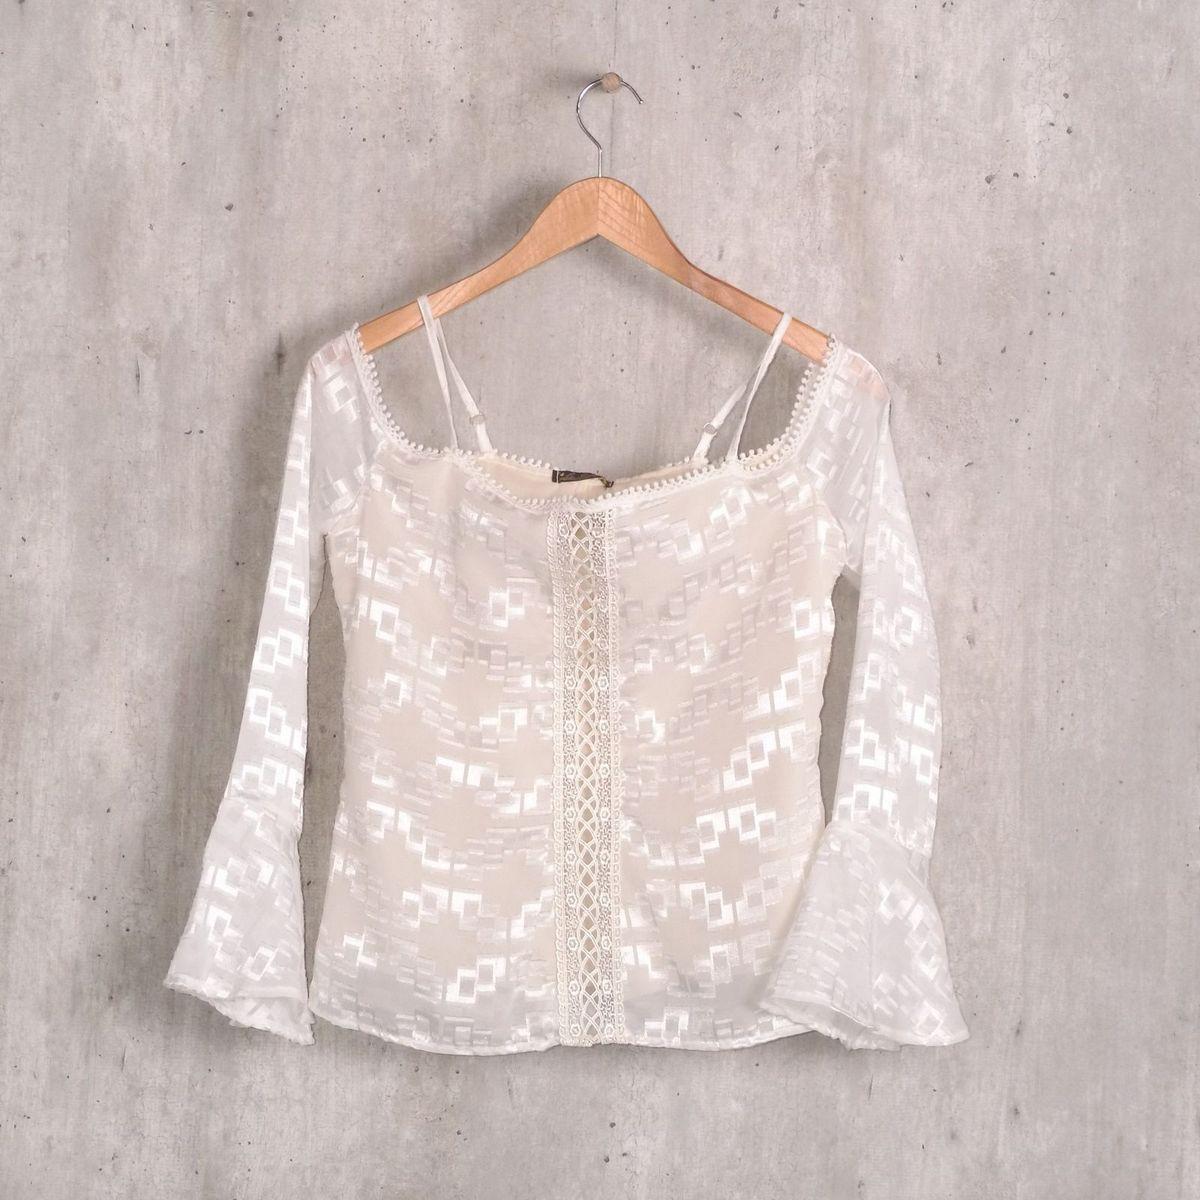 blusa branca bordada manga caida - blusas la gata e9c9f8a7435cc